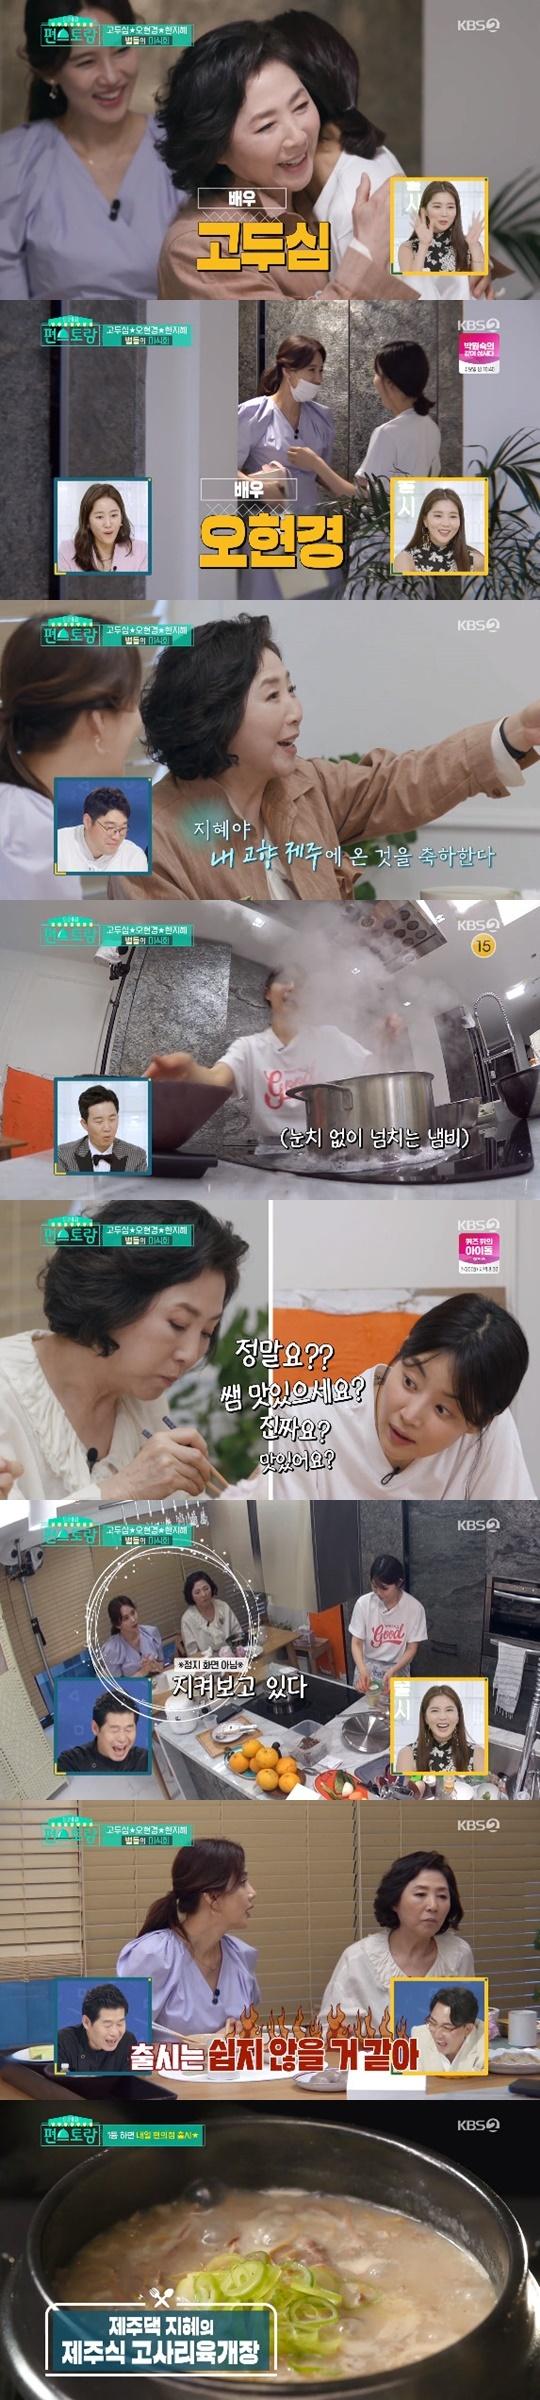 [RE:TV] '편스토랑' 한지혜, 고두심x오현경 앞에서 부담감↑…시식평은?